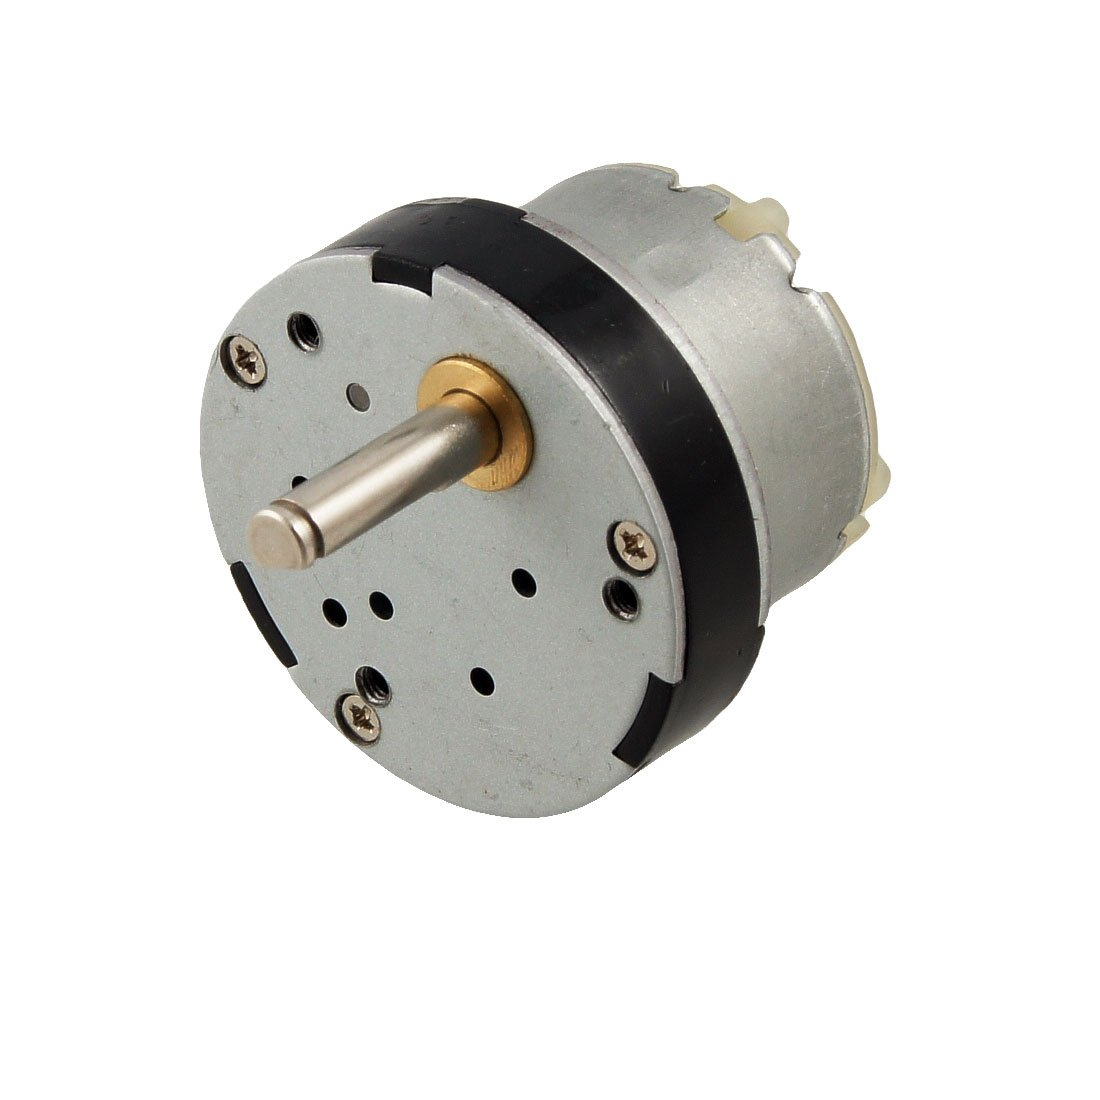 uxcell 32mm Dia Magnetic Gear Box Motor 40GB 100 RPM 50MA 6V DC Silver Tone